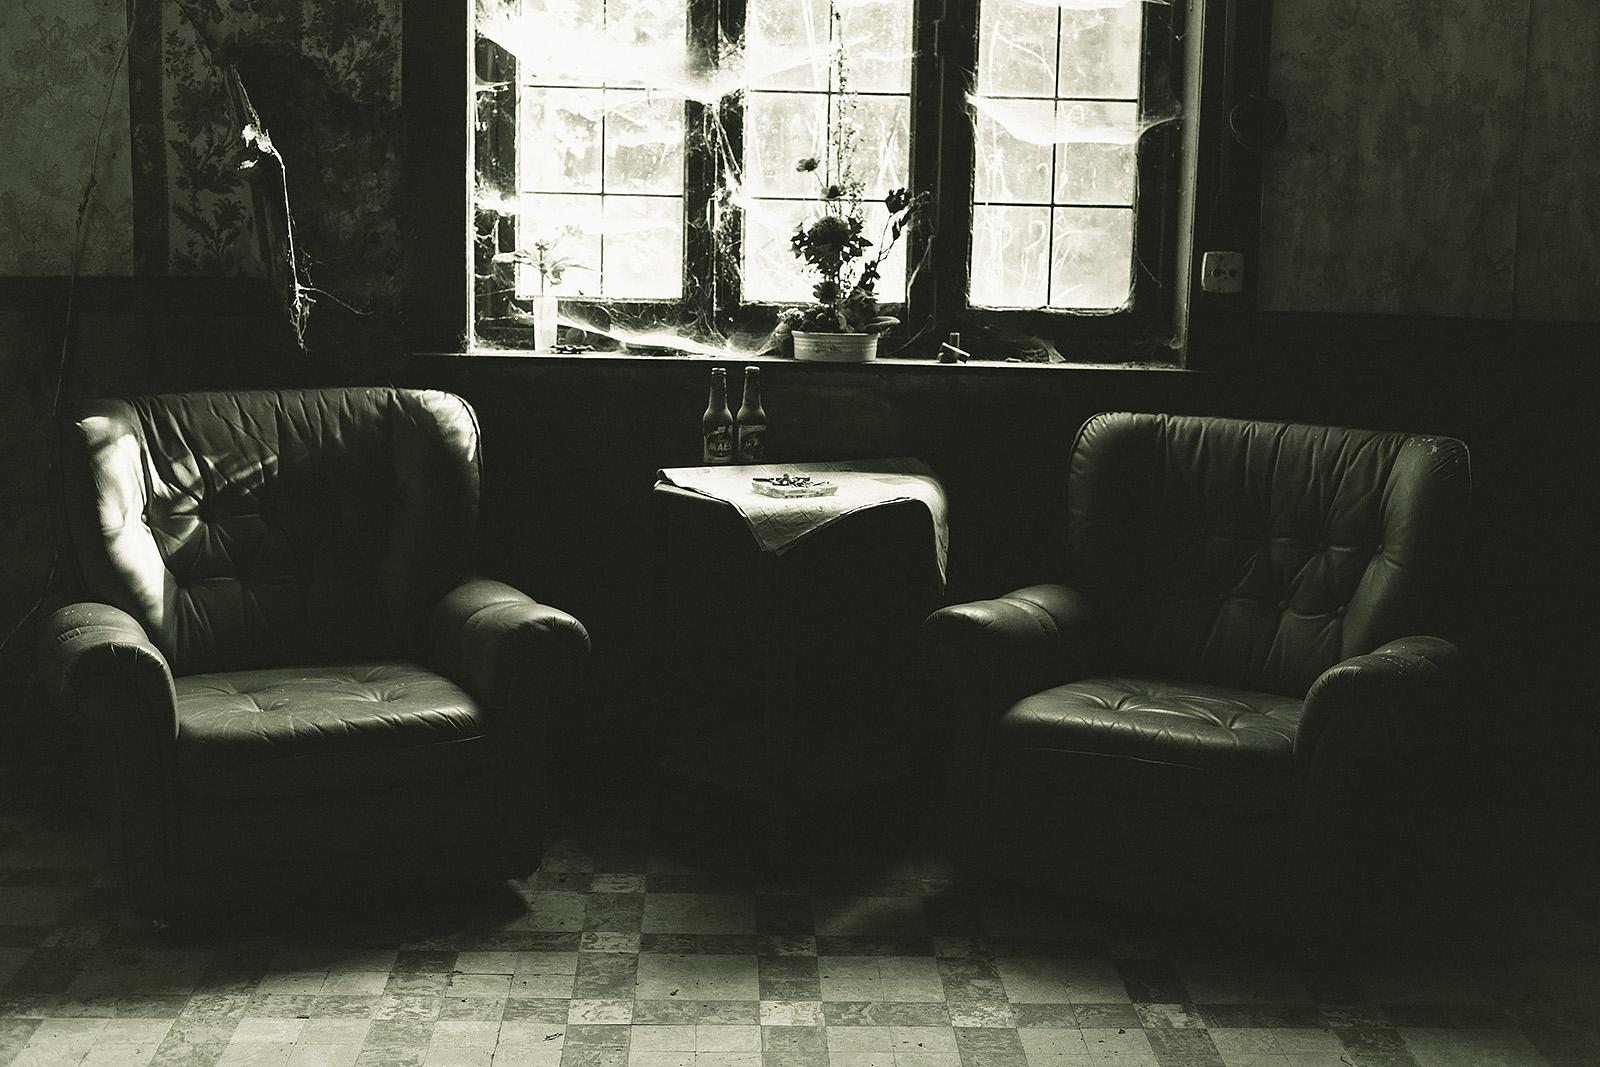 Fondos de pantalla antiguo monocromo ventana interior for Casa elegante en mal estado